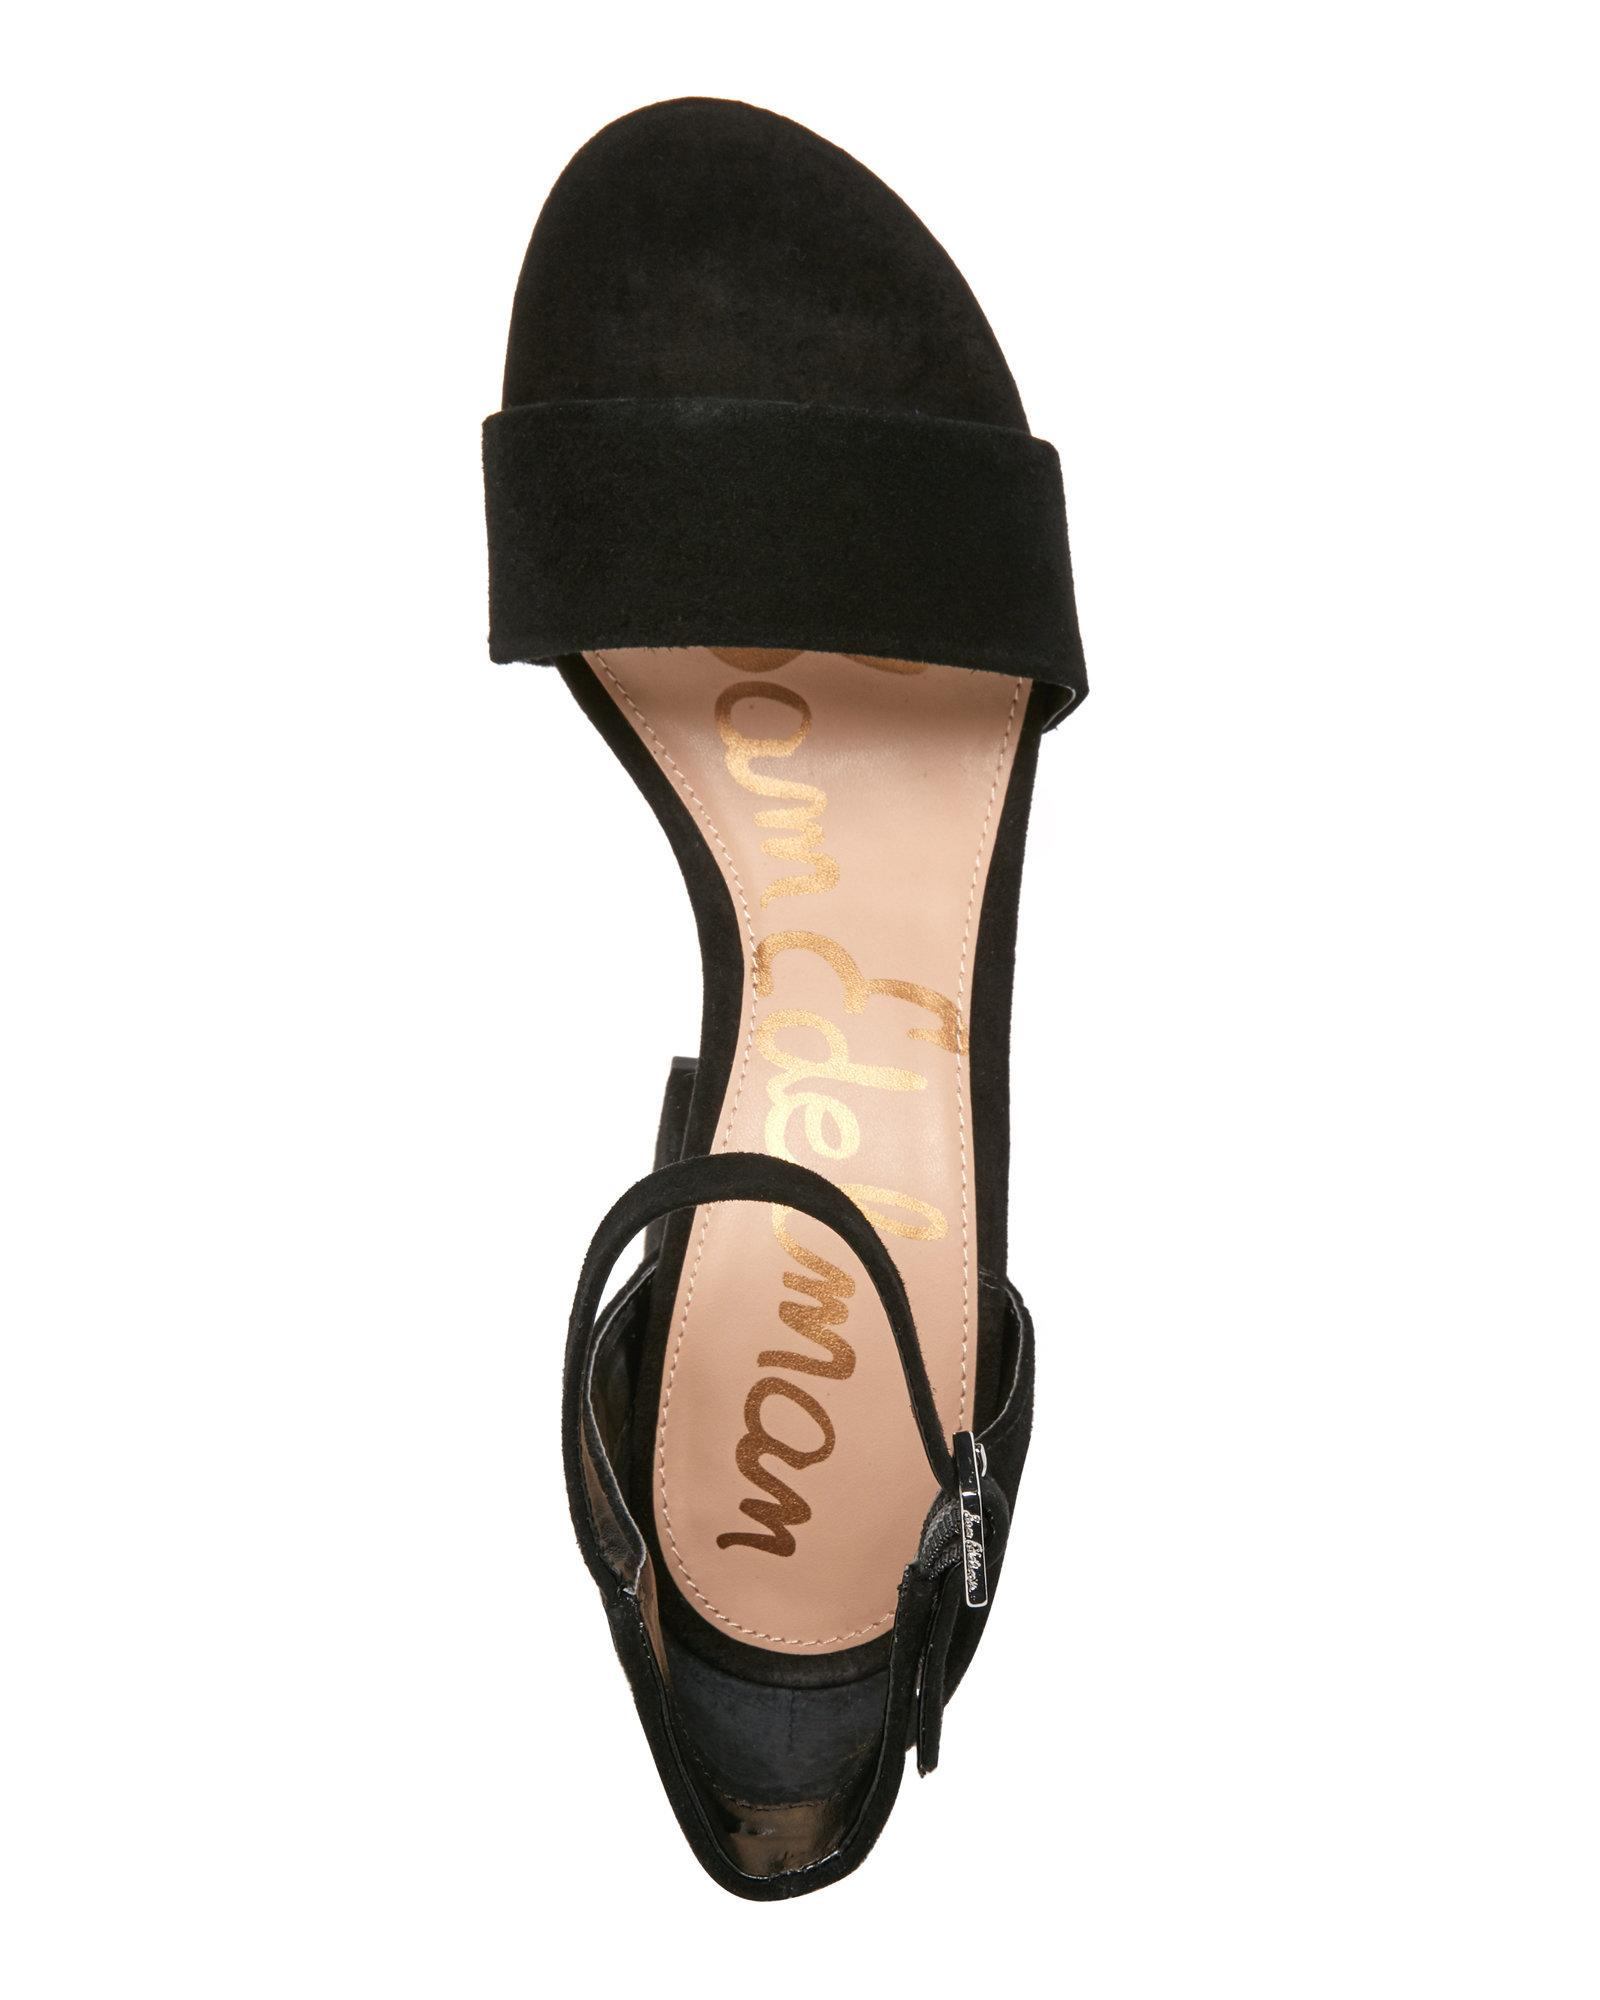 48413b45500 Lyst - Sam Edelman Black Torrence Two-Piece Block Heel Sandals in Black